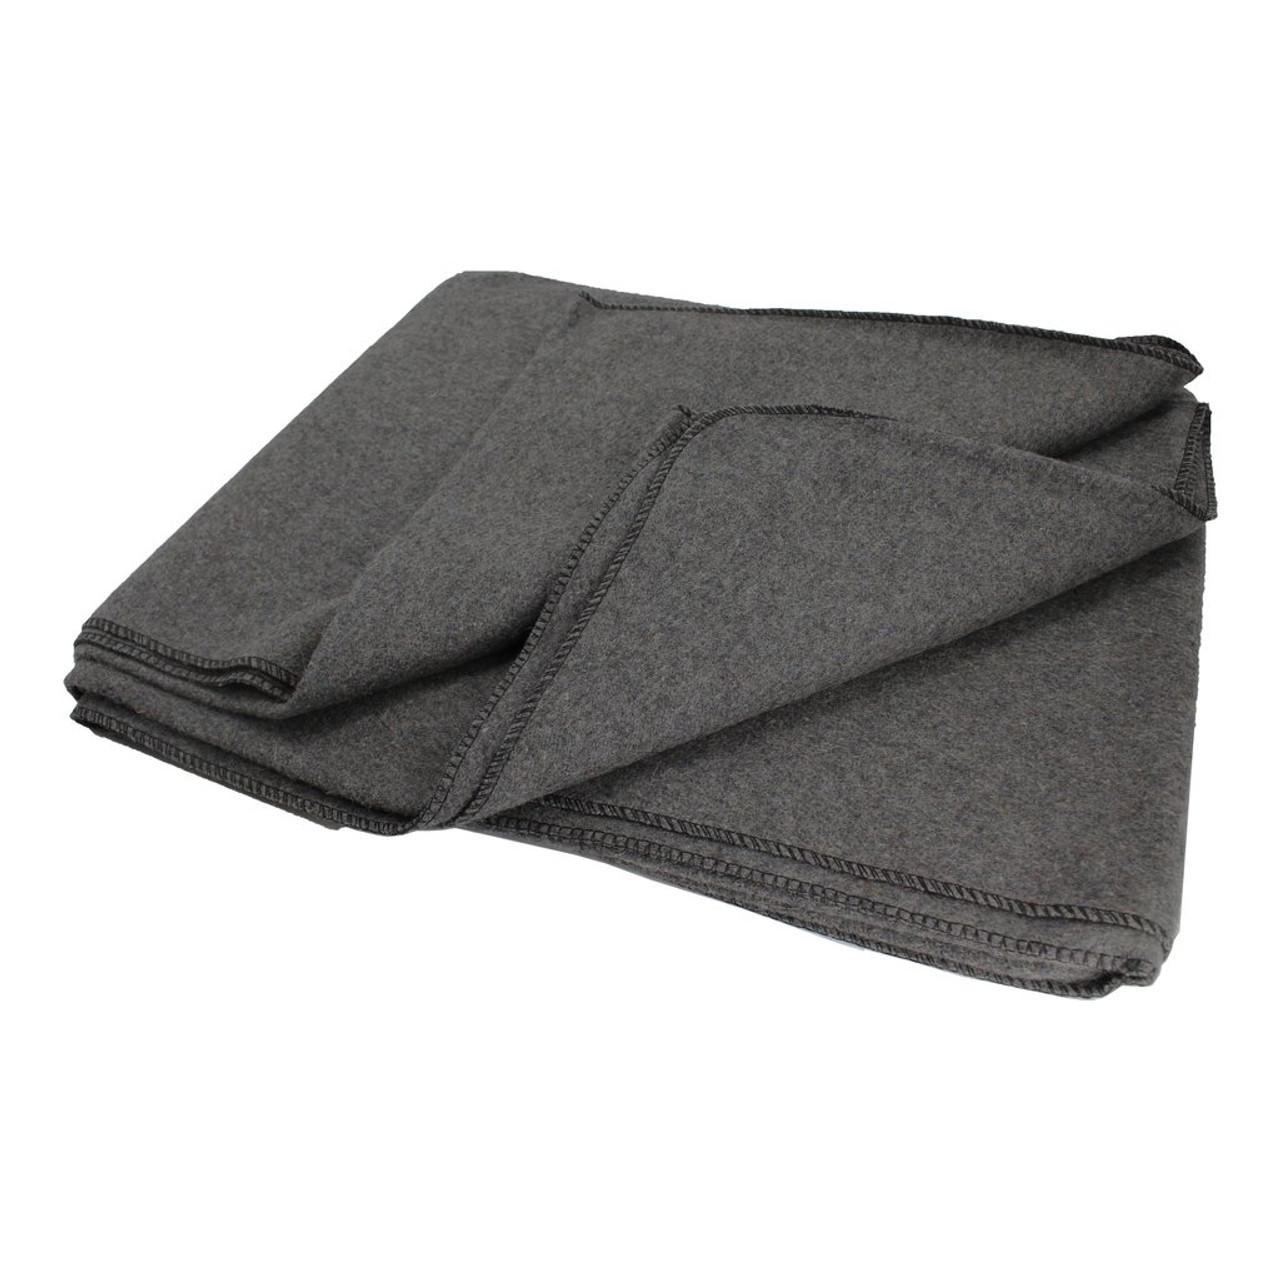 "Ready First Aid 80% Wool Blanket (Gray) 64"" x 84"""